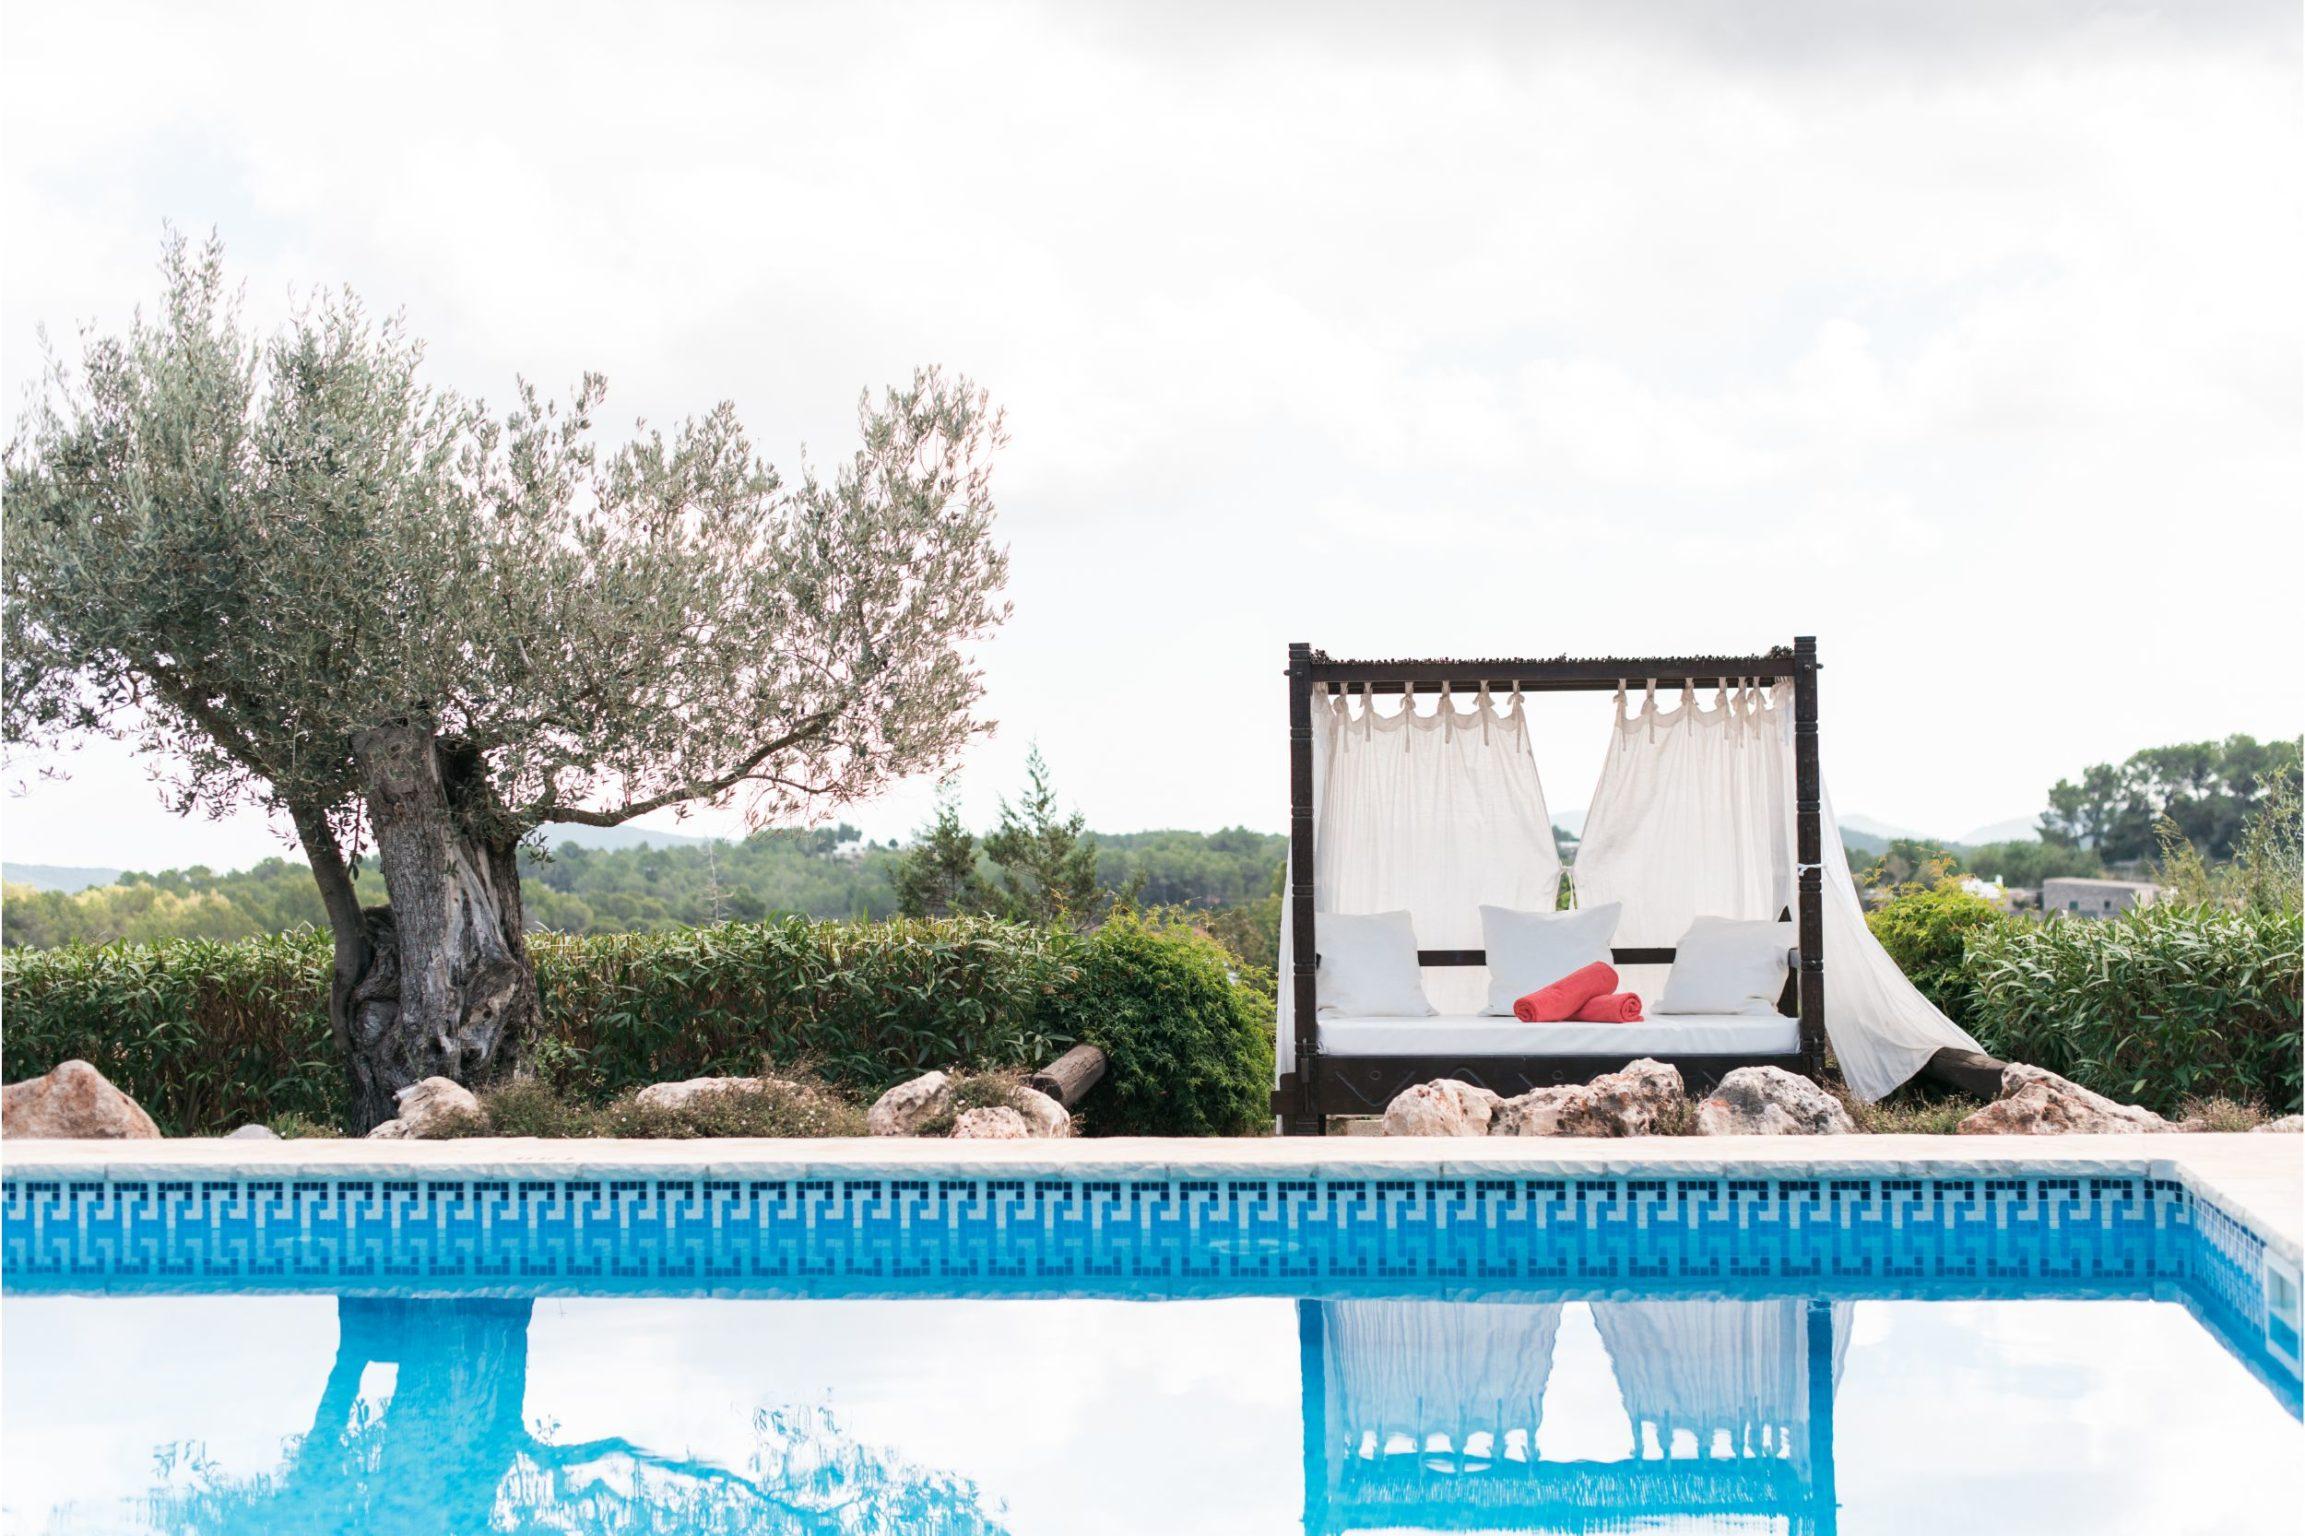 https://www.white-ibiza.com/wp-content/uploads/2020/02/Copy-of-white-ibiza-villas-can-blay-outdoors-pool-2305x1536.jpg